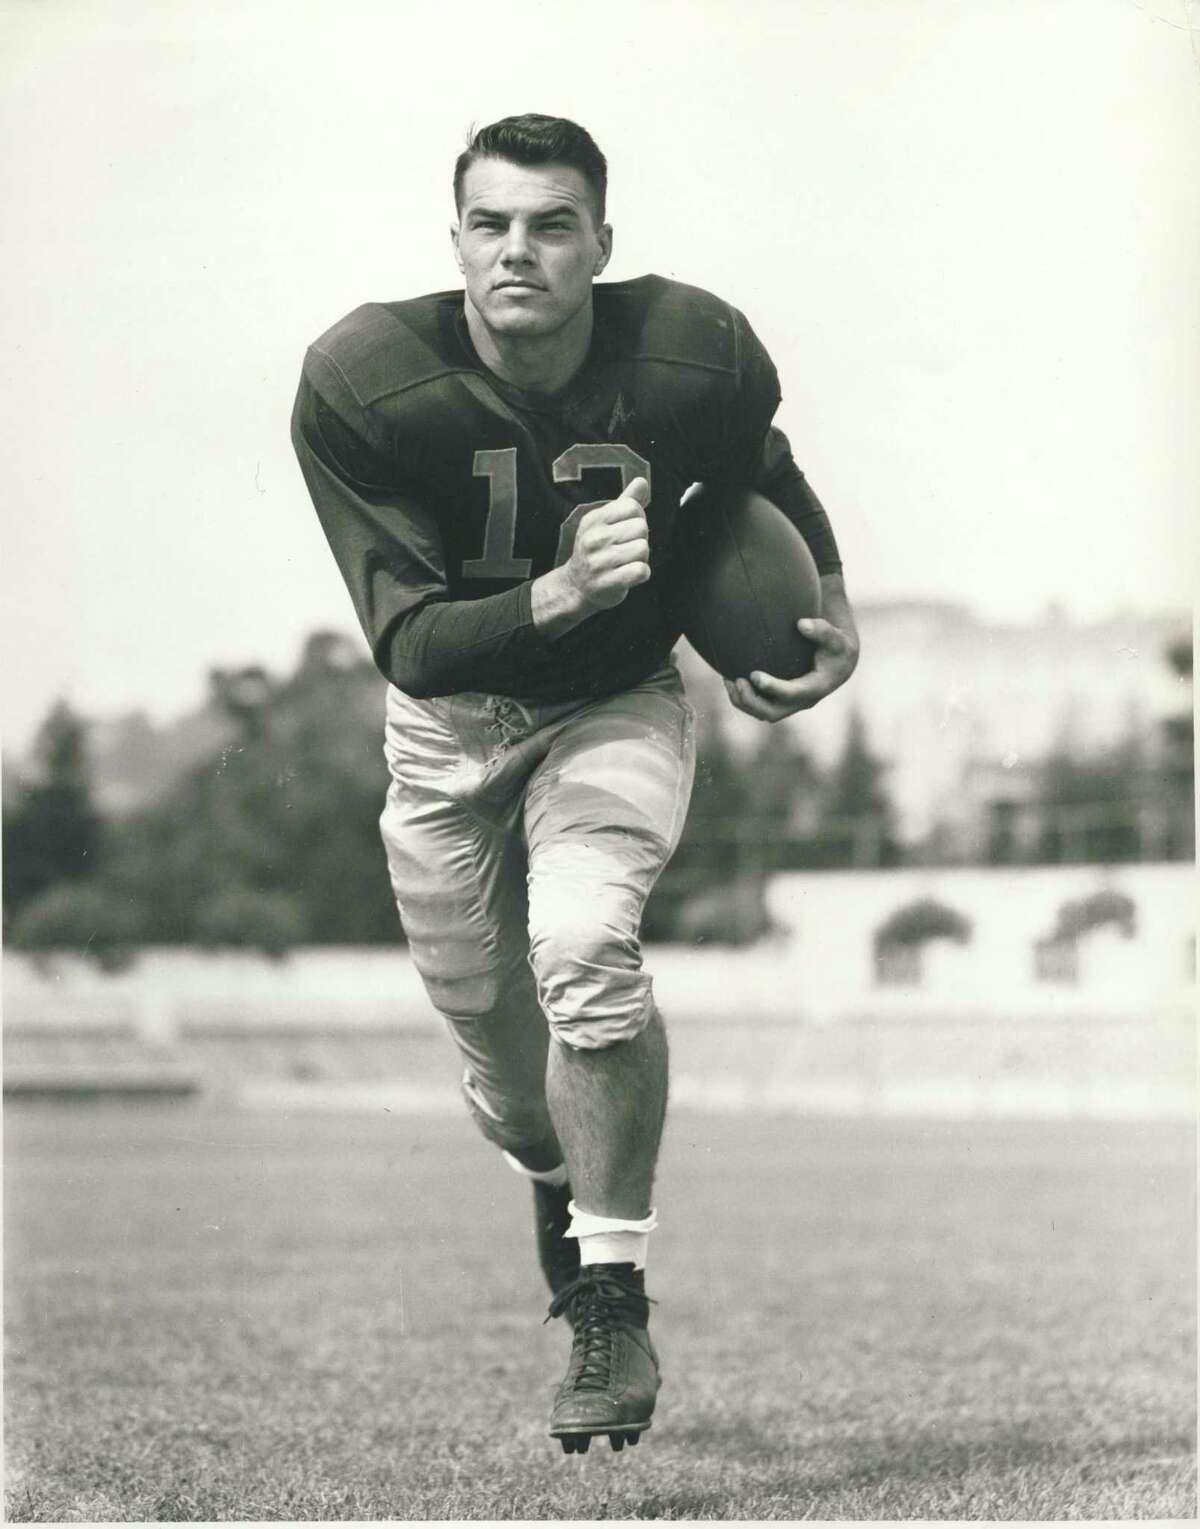 Pete Schabarum played on three Rose Bowl teams at Cal.